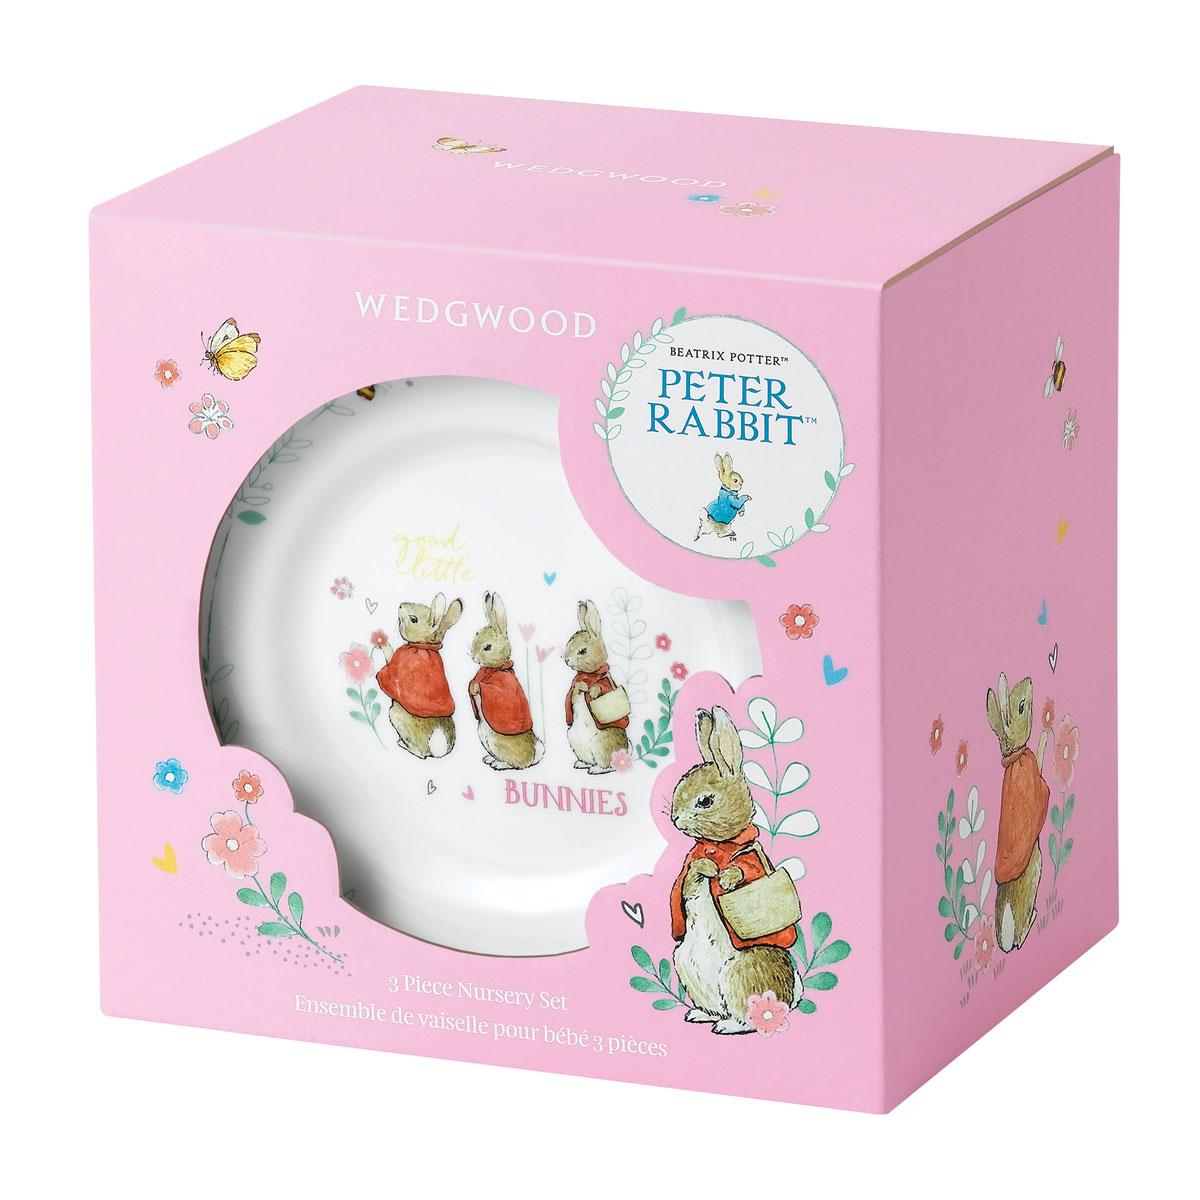 Wedgwood China Peter Rabbit Girl